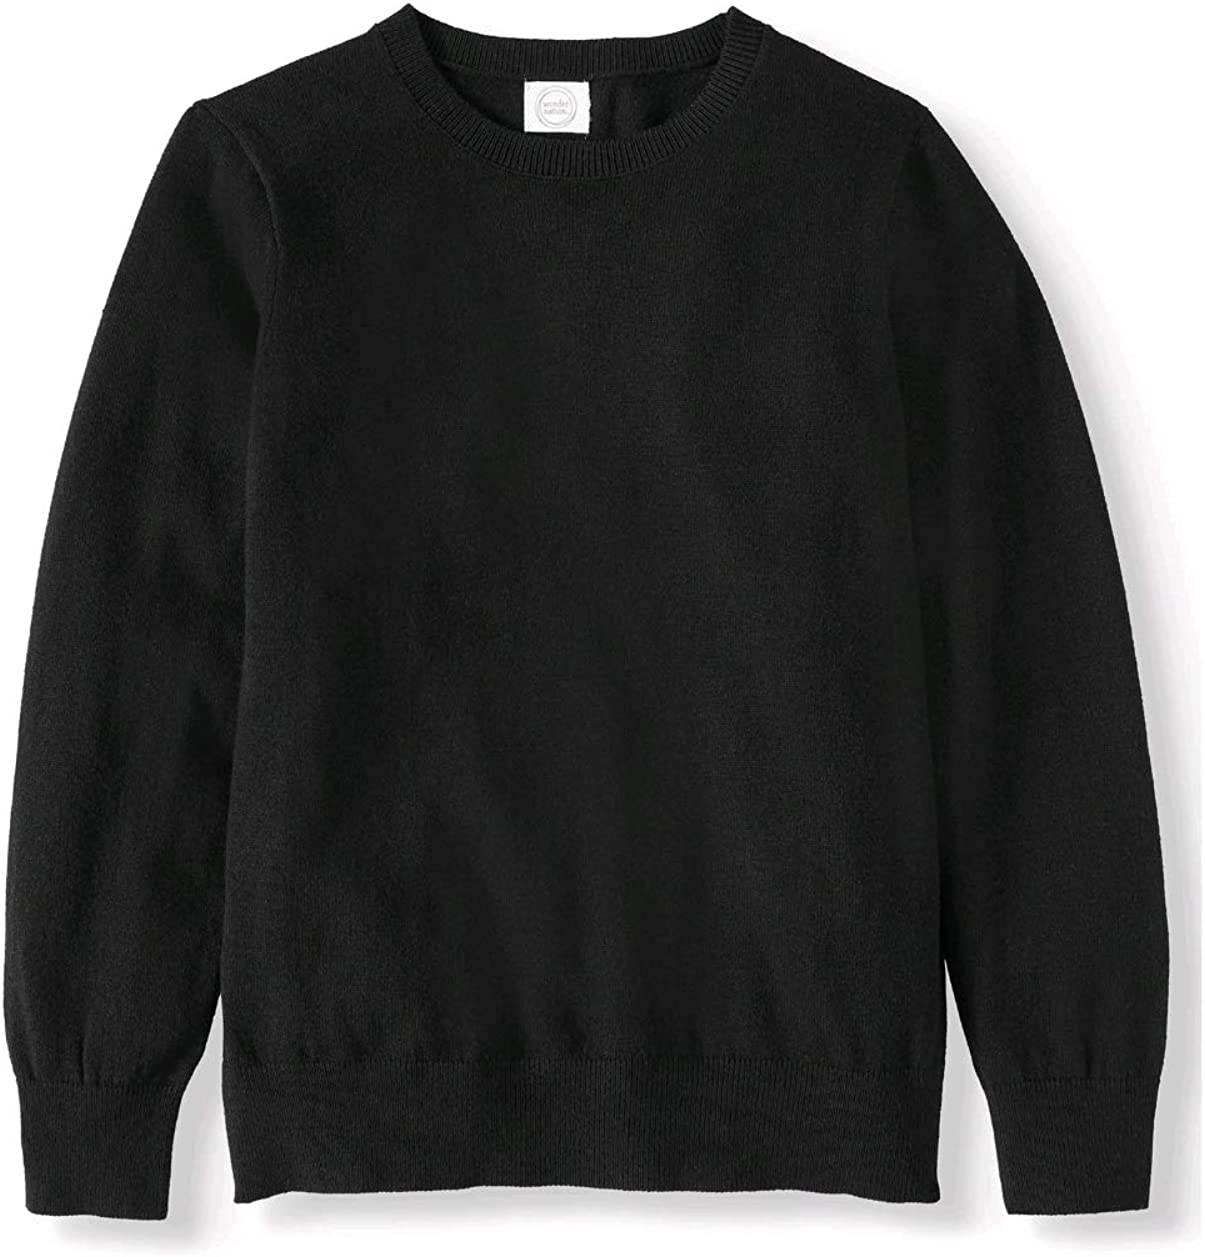 Boys Wonder Nation Long Sleeve Crewneck Sweater, Black, (Large, 10-12 Husky)